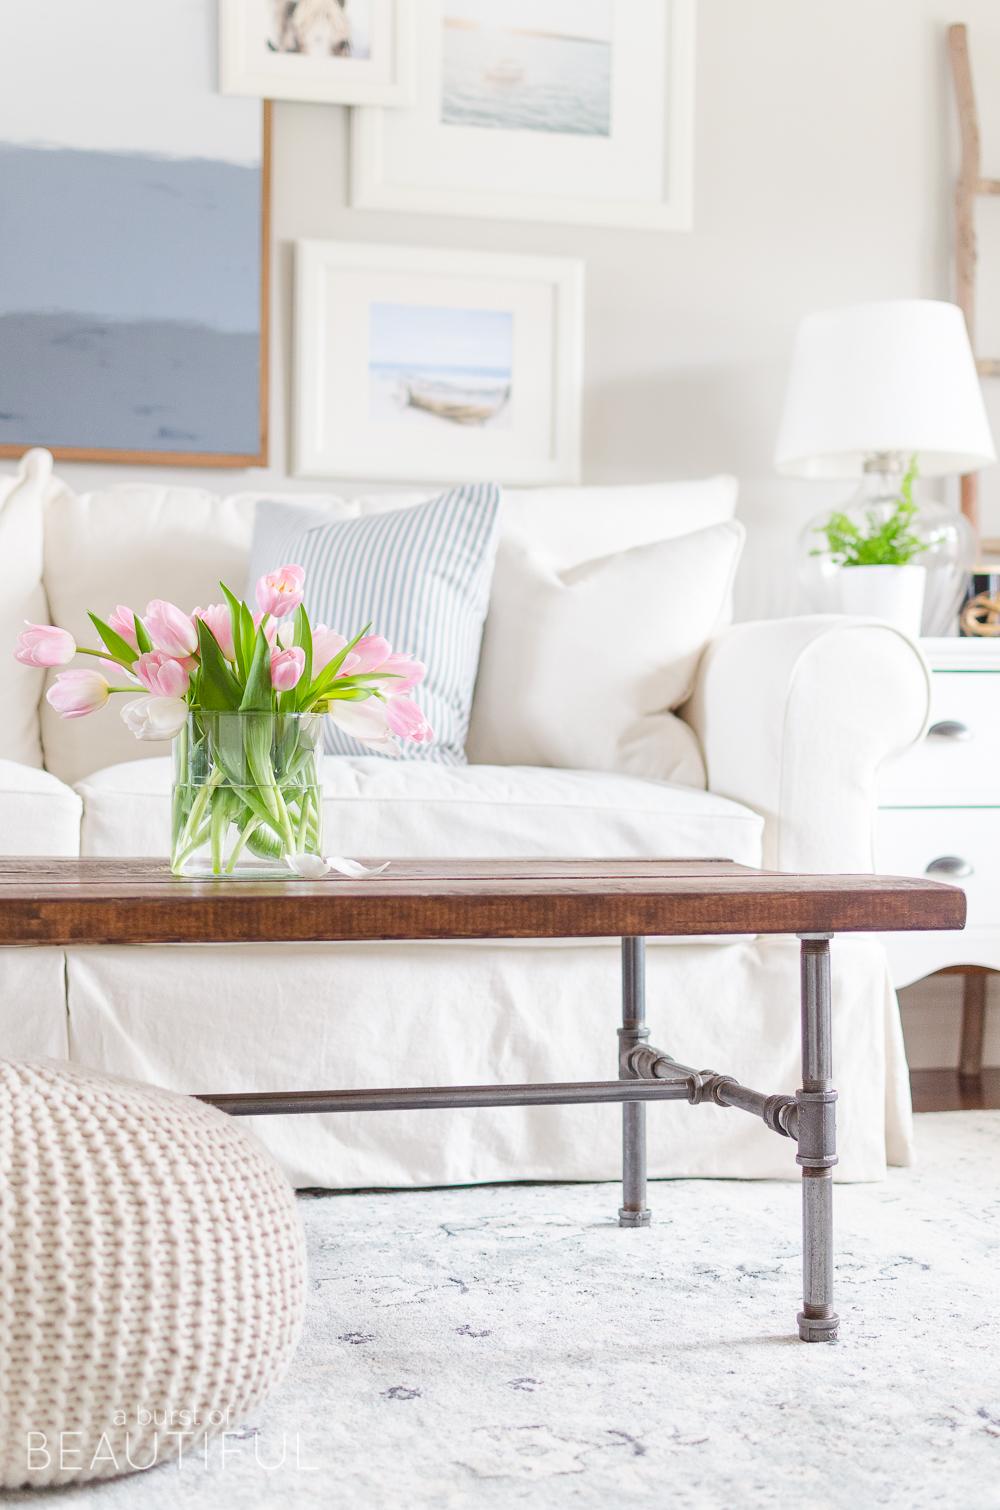 New navy blue vintage wash rug in our living room nick - Navy rug living room ...